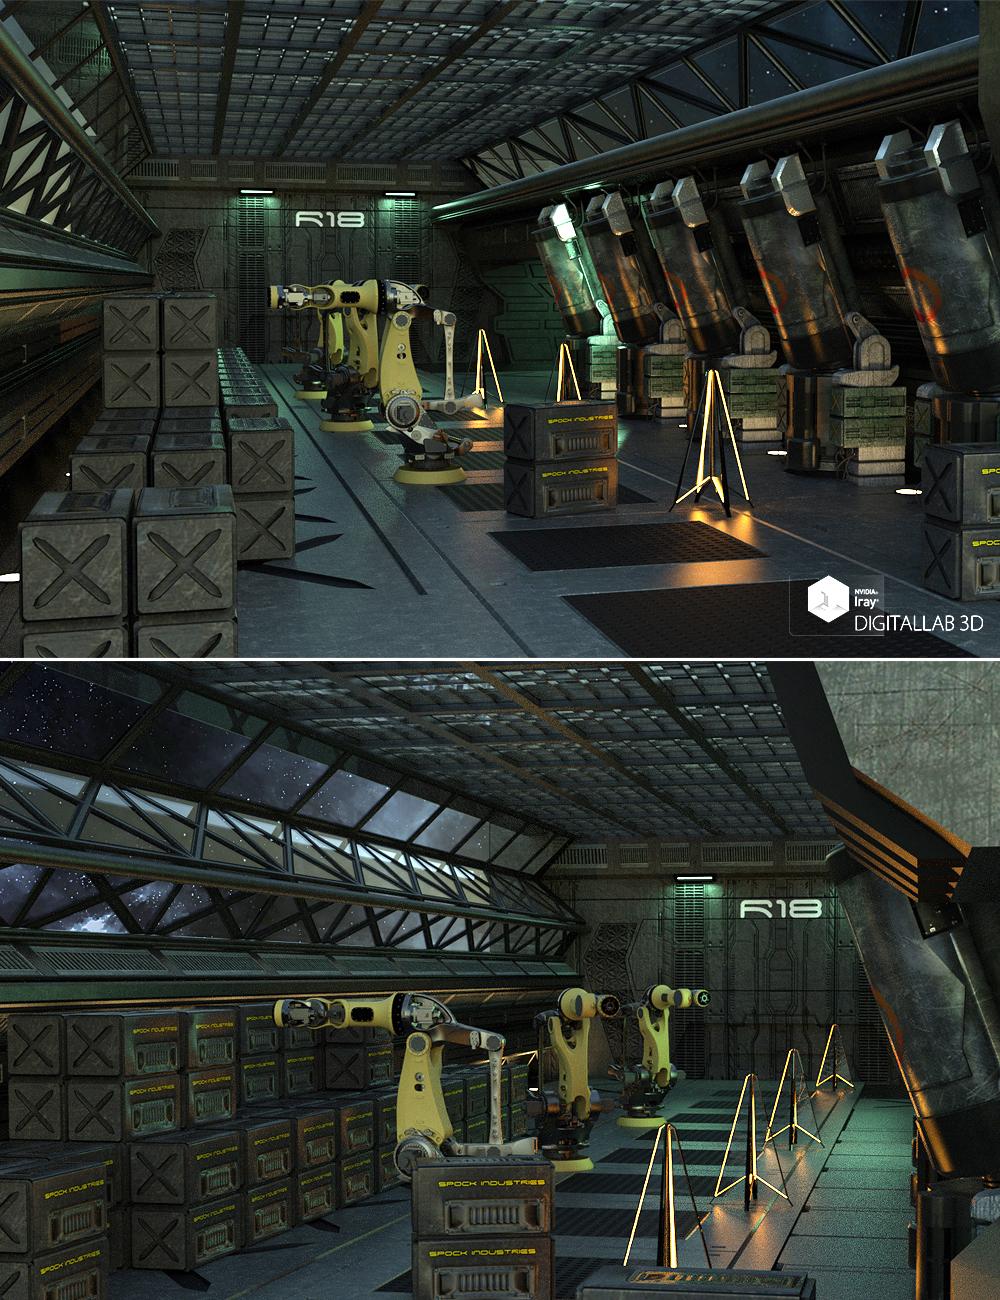 Reactor Room by: Digitallab3D, 3D Models by Daz 3D